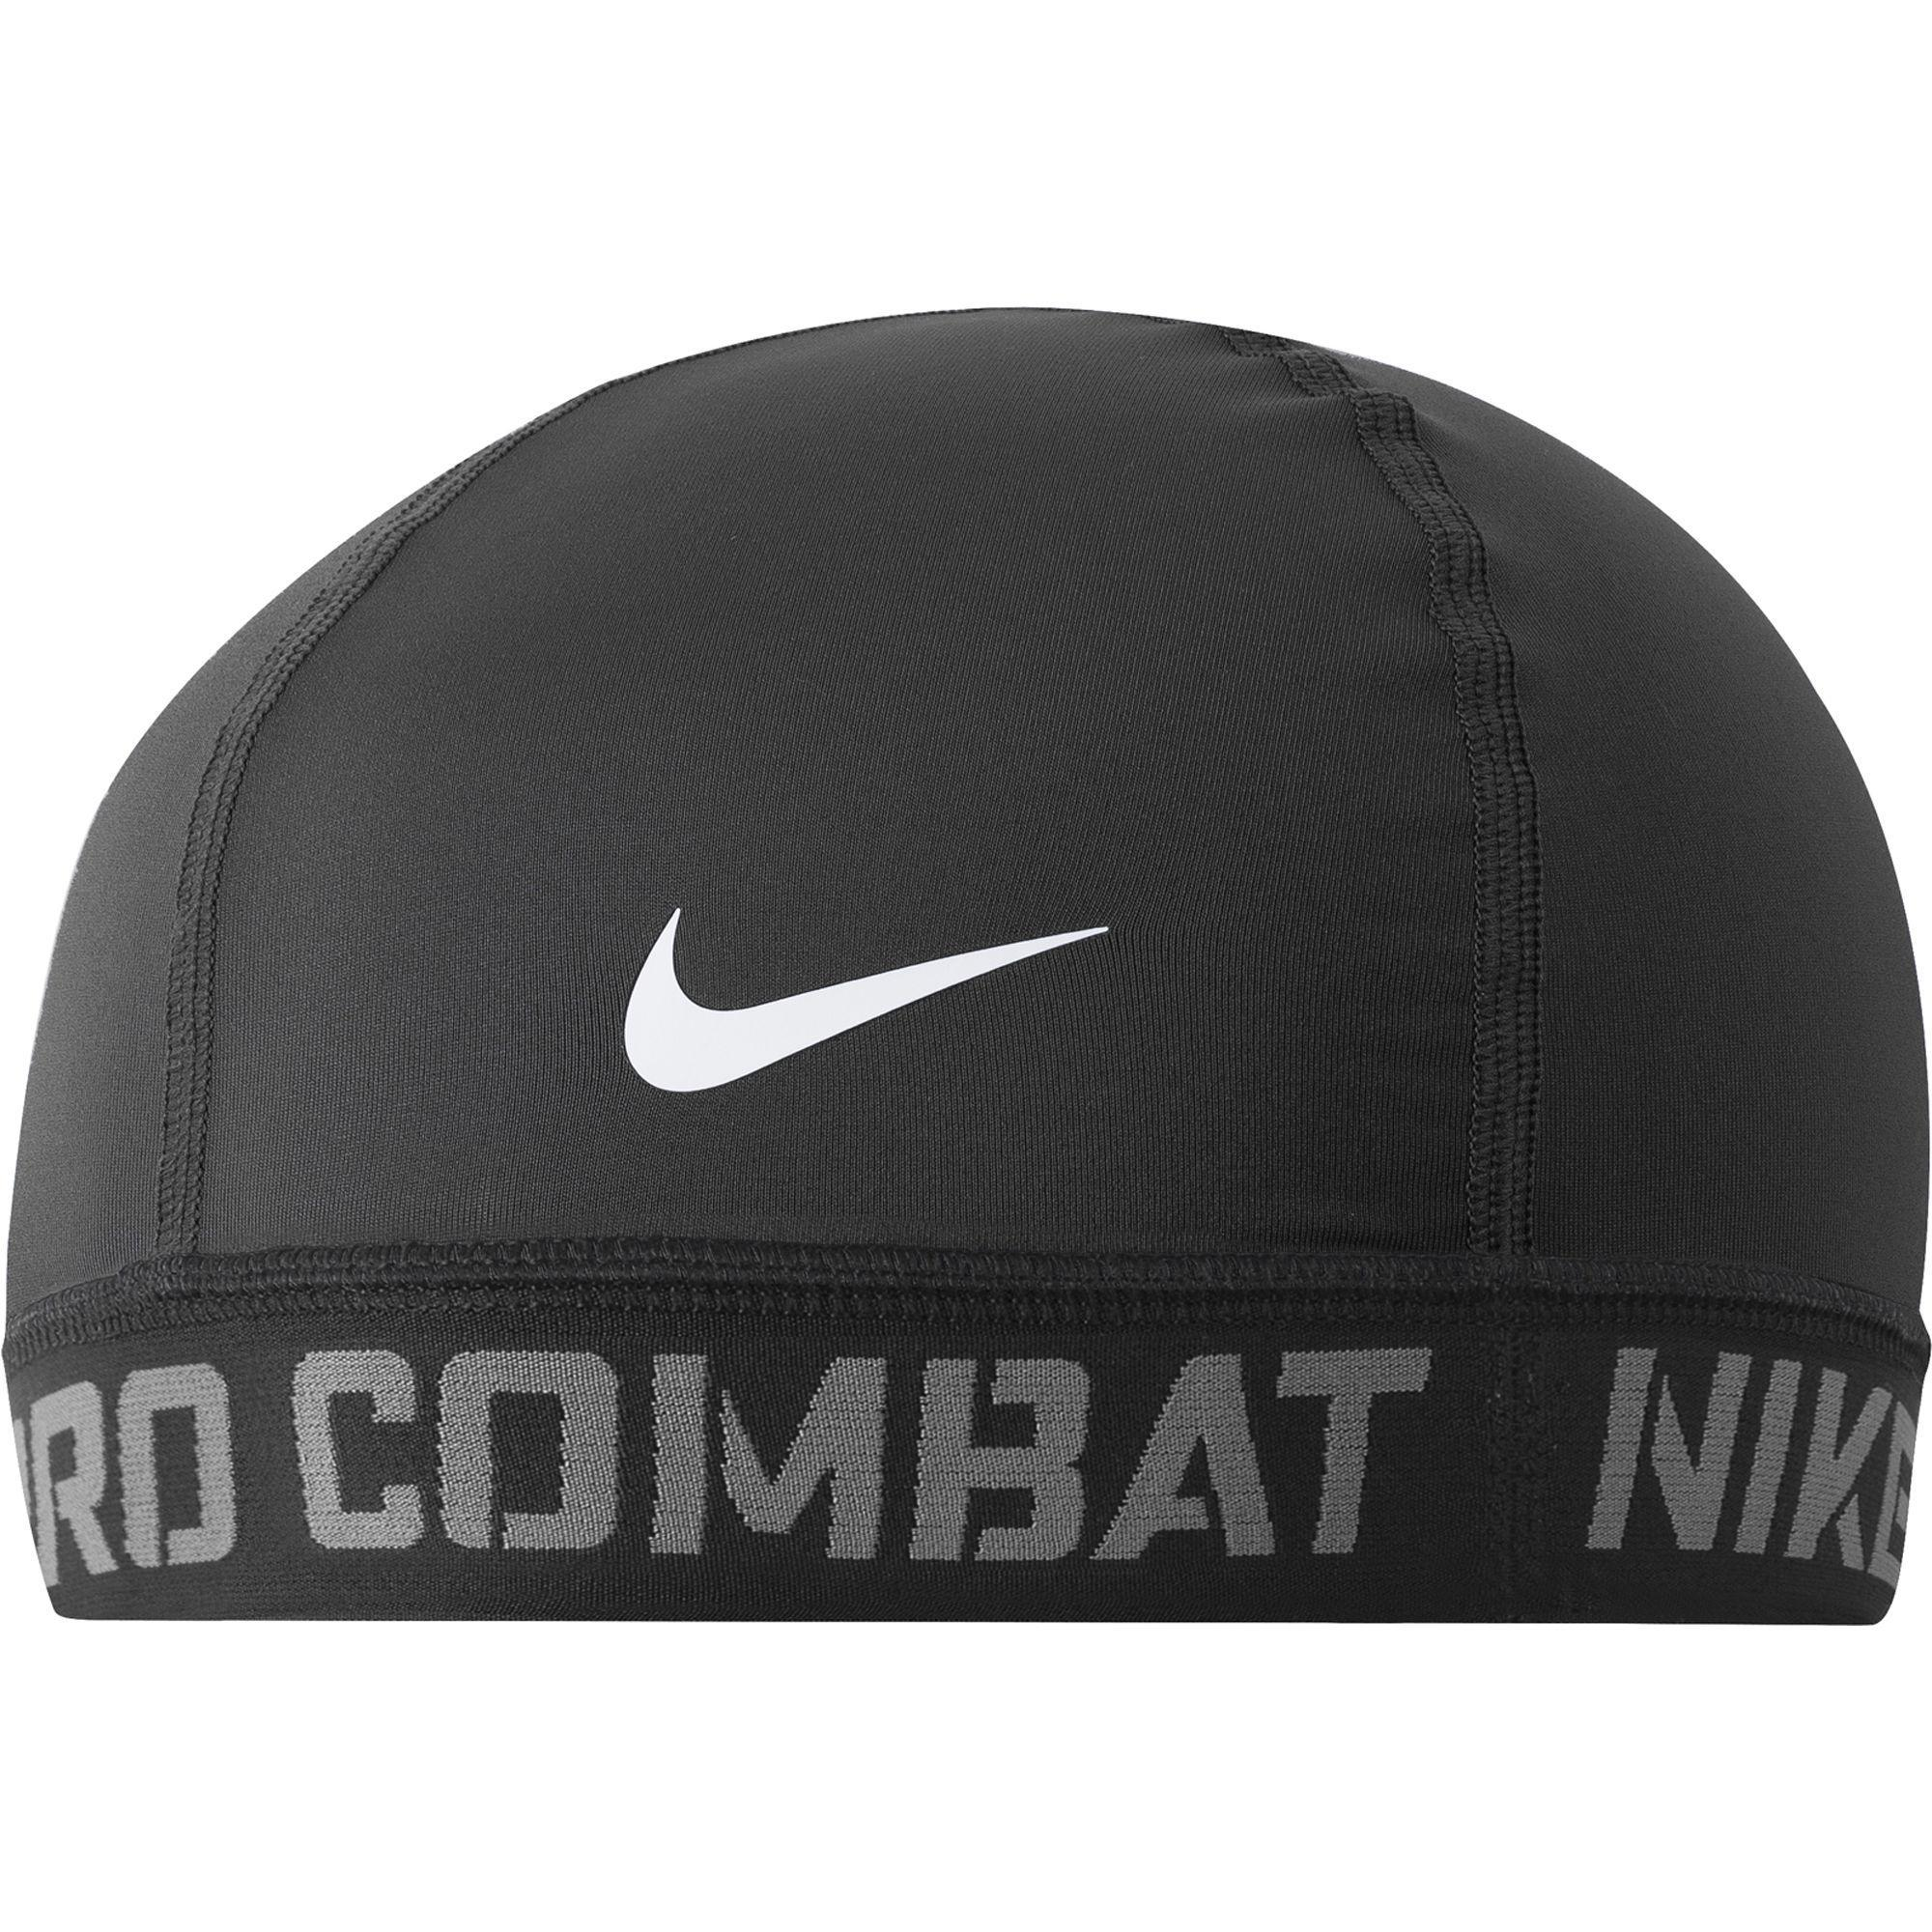 fef9a7ac5 Nike Pro Combat Banded Skull Cap 2.0 - Black